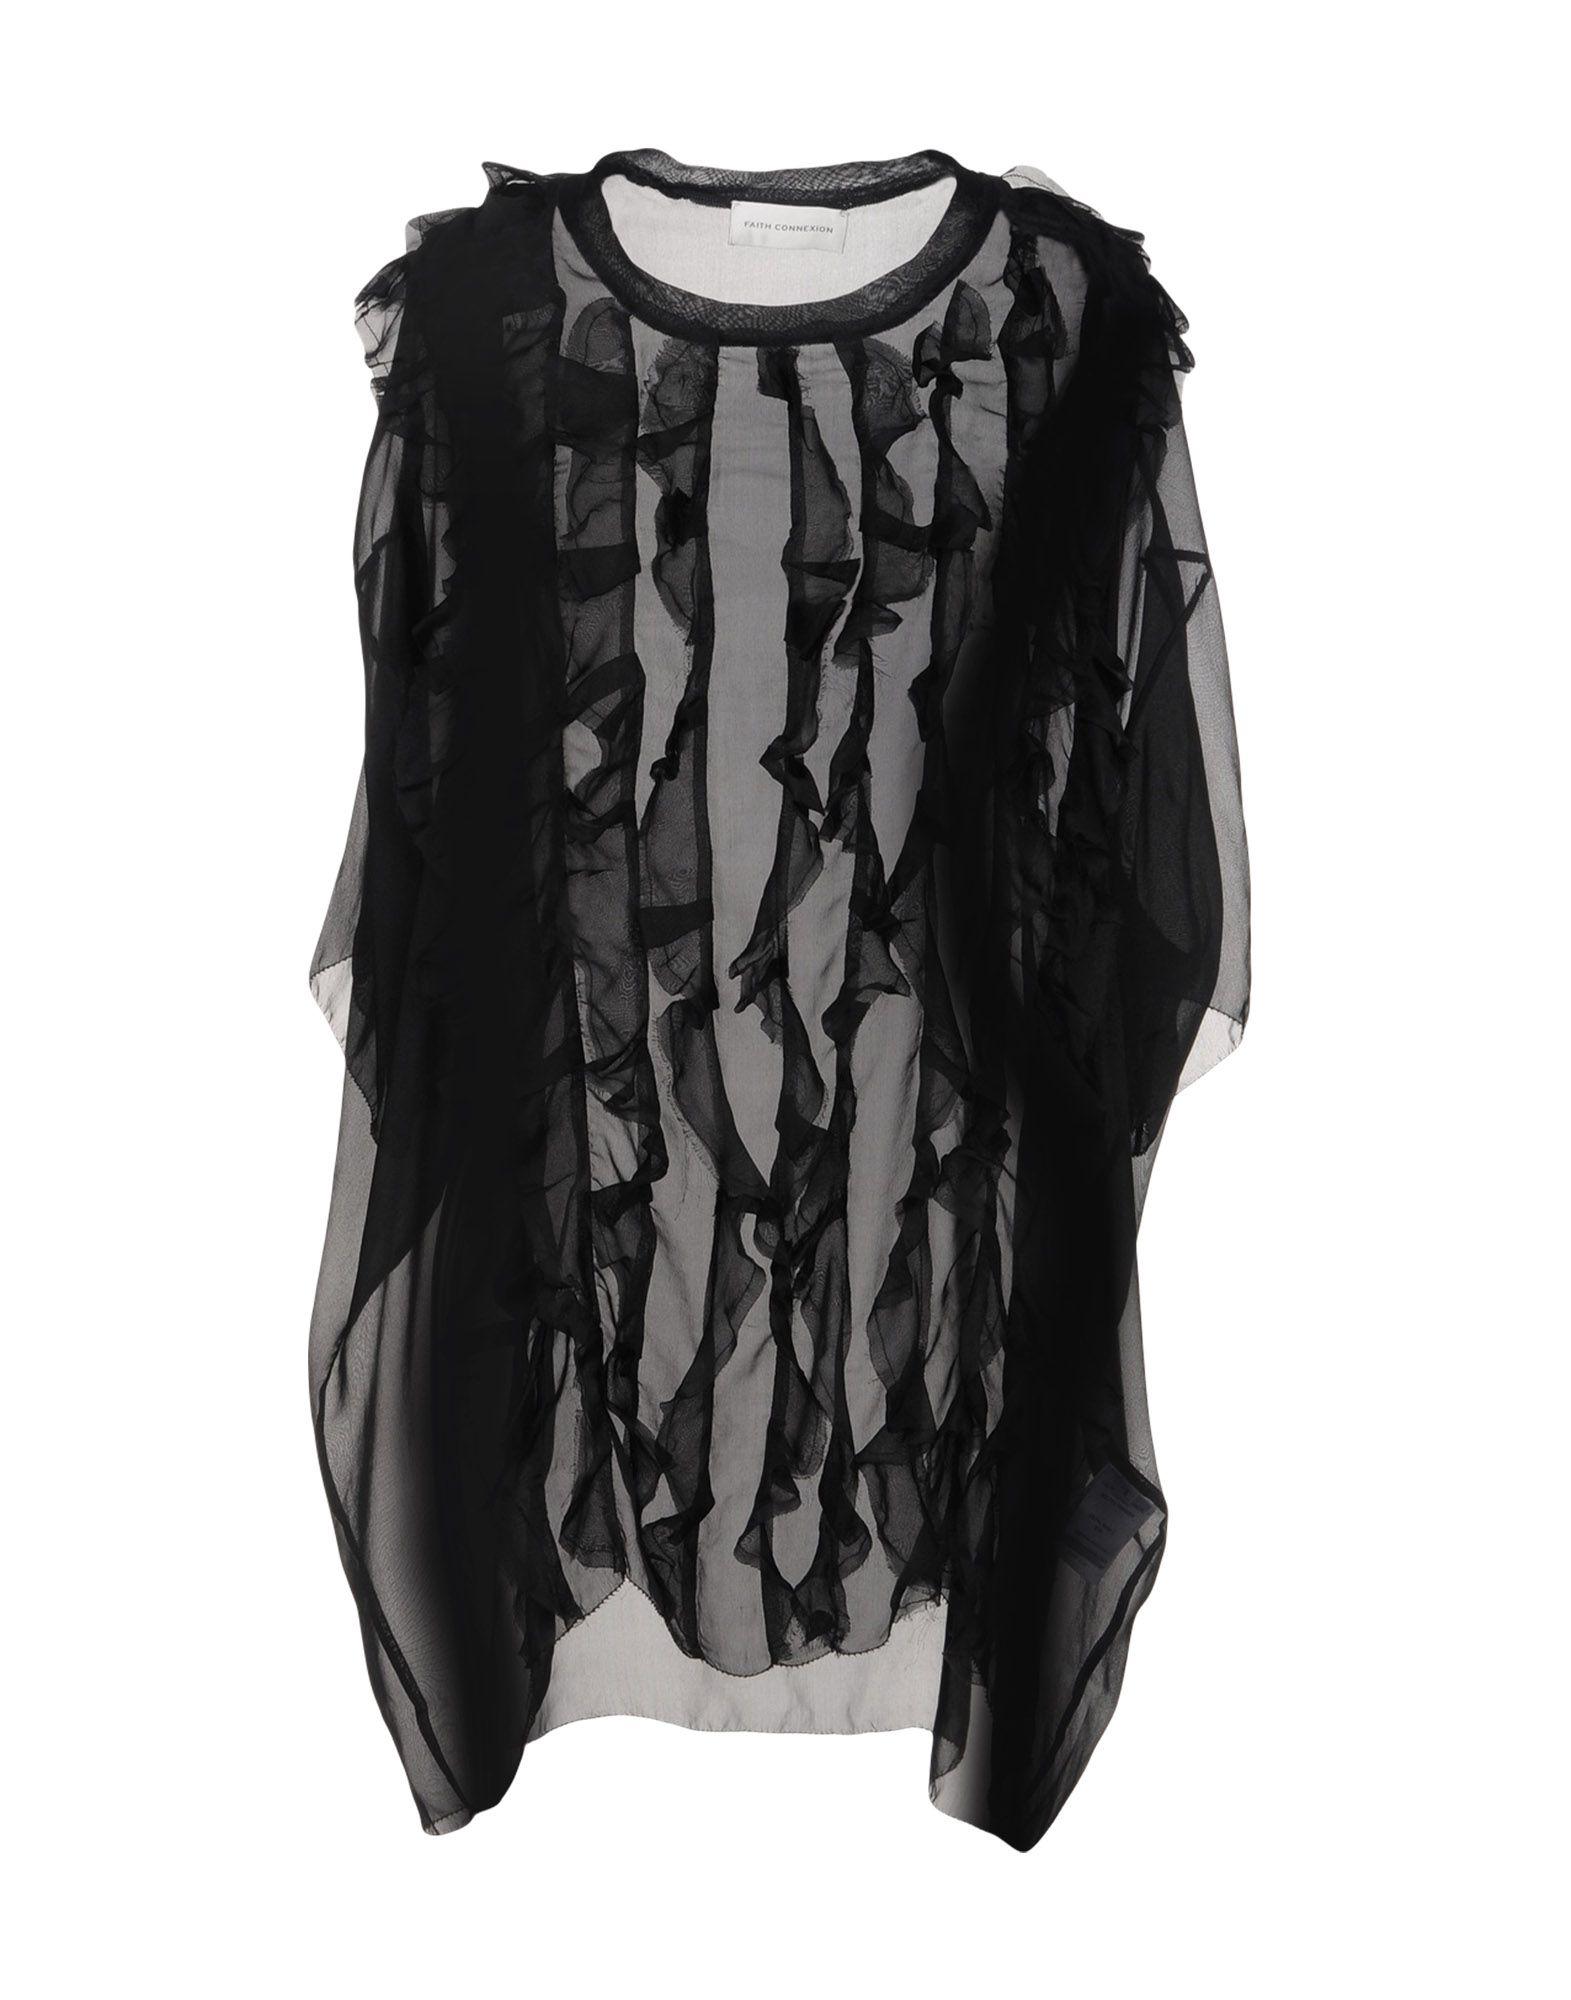 FAITH CONNEXION Блузка платье faith connexion цвет черный